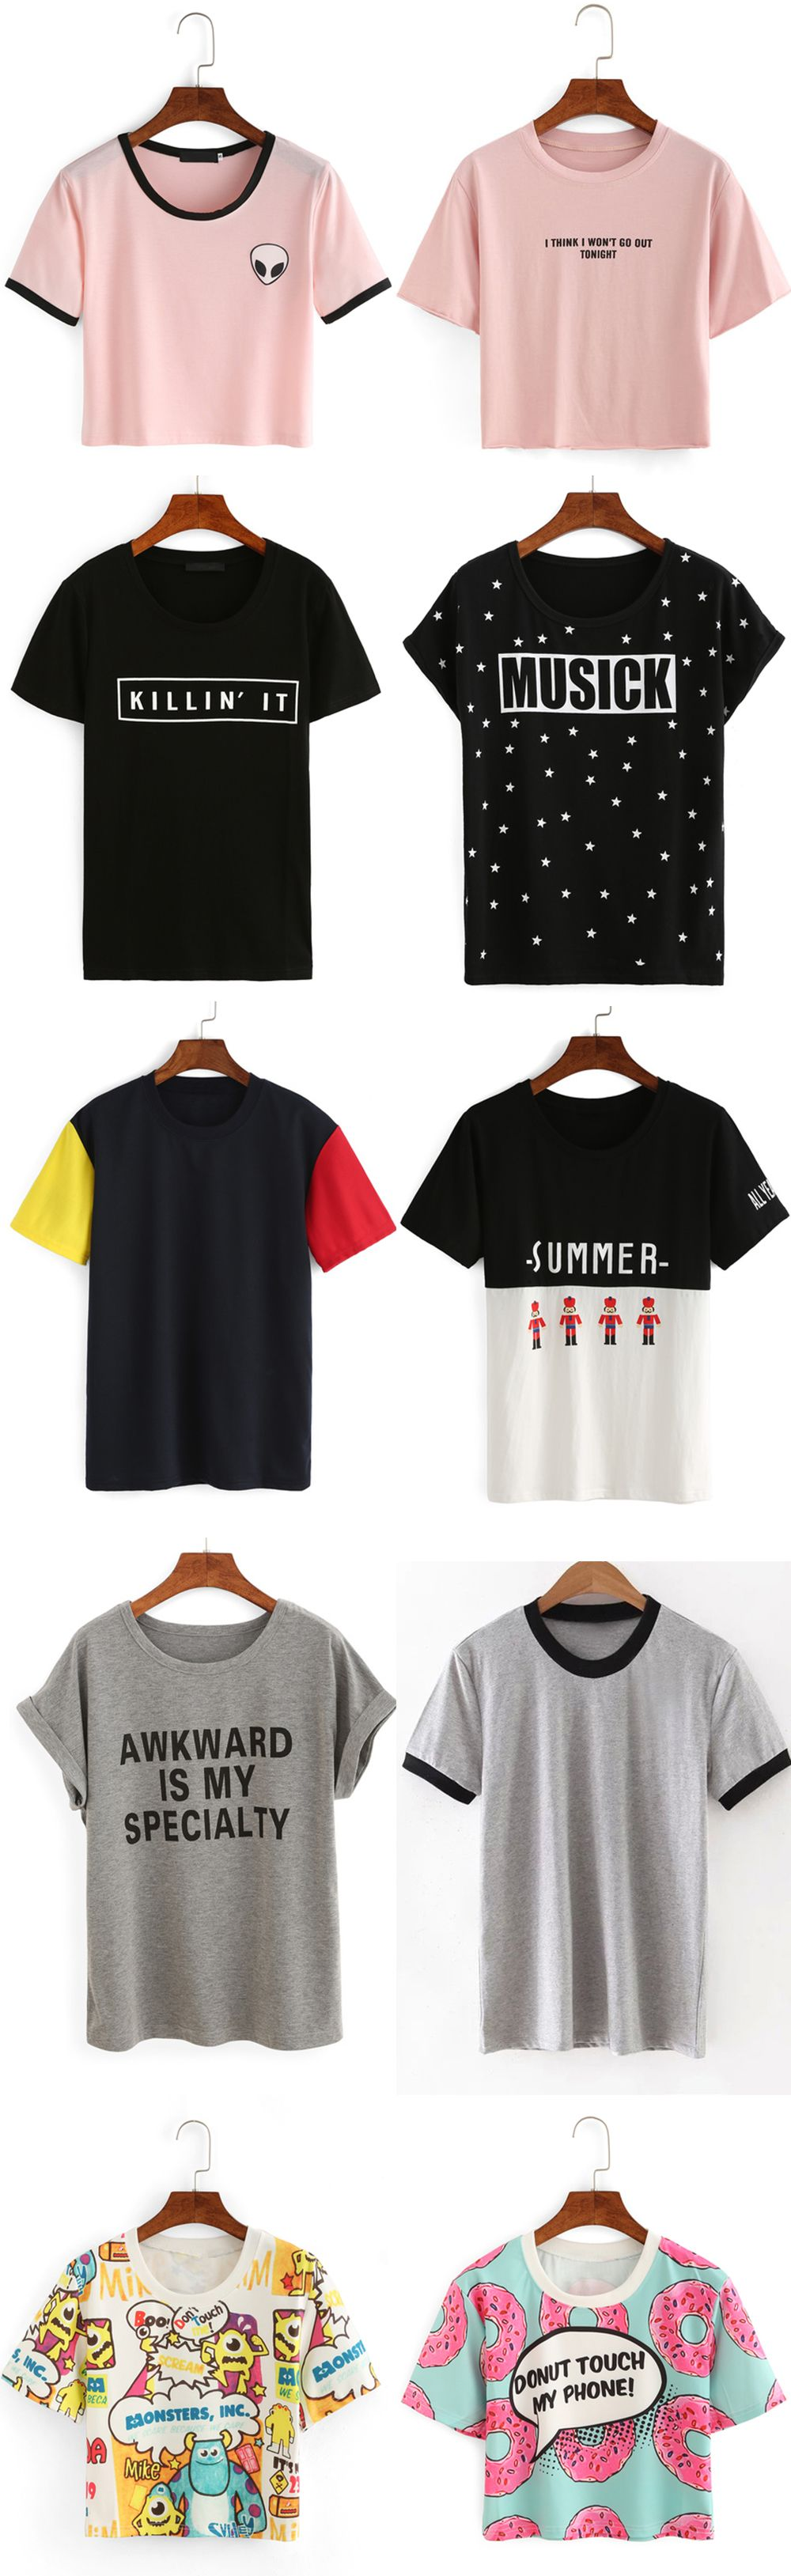 suggestions-for-teenage-girl-tshirt-designs